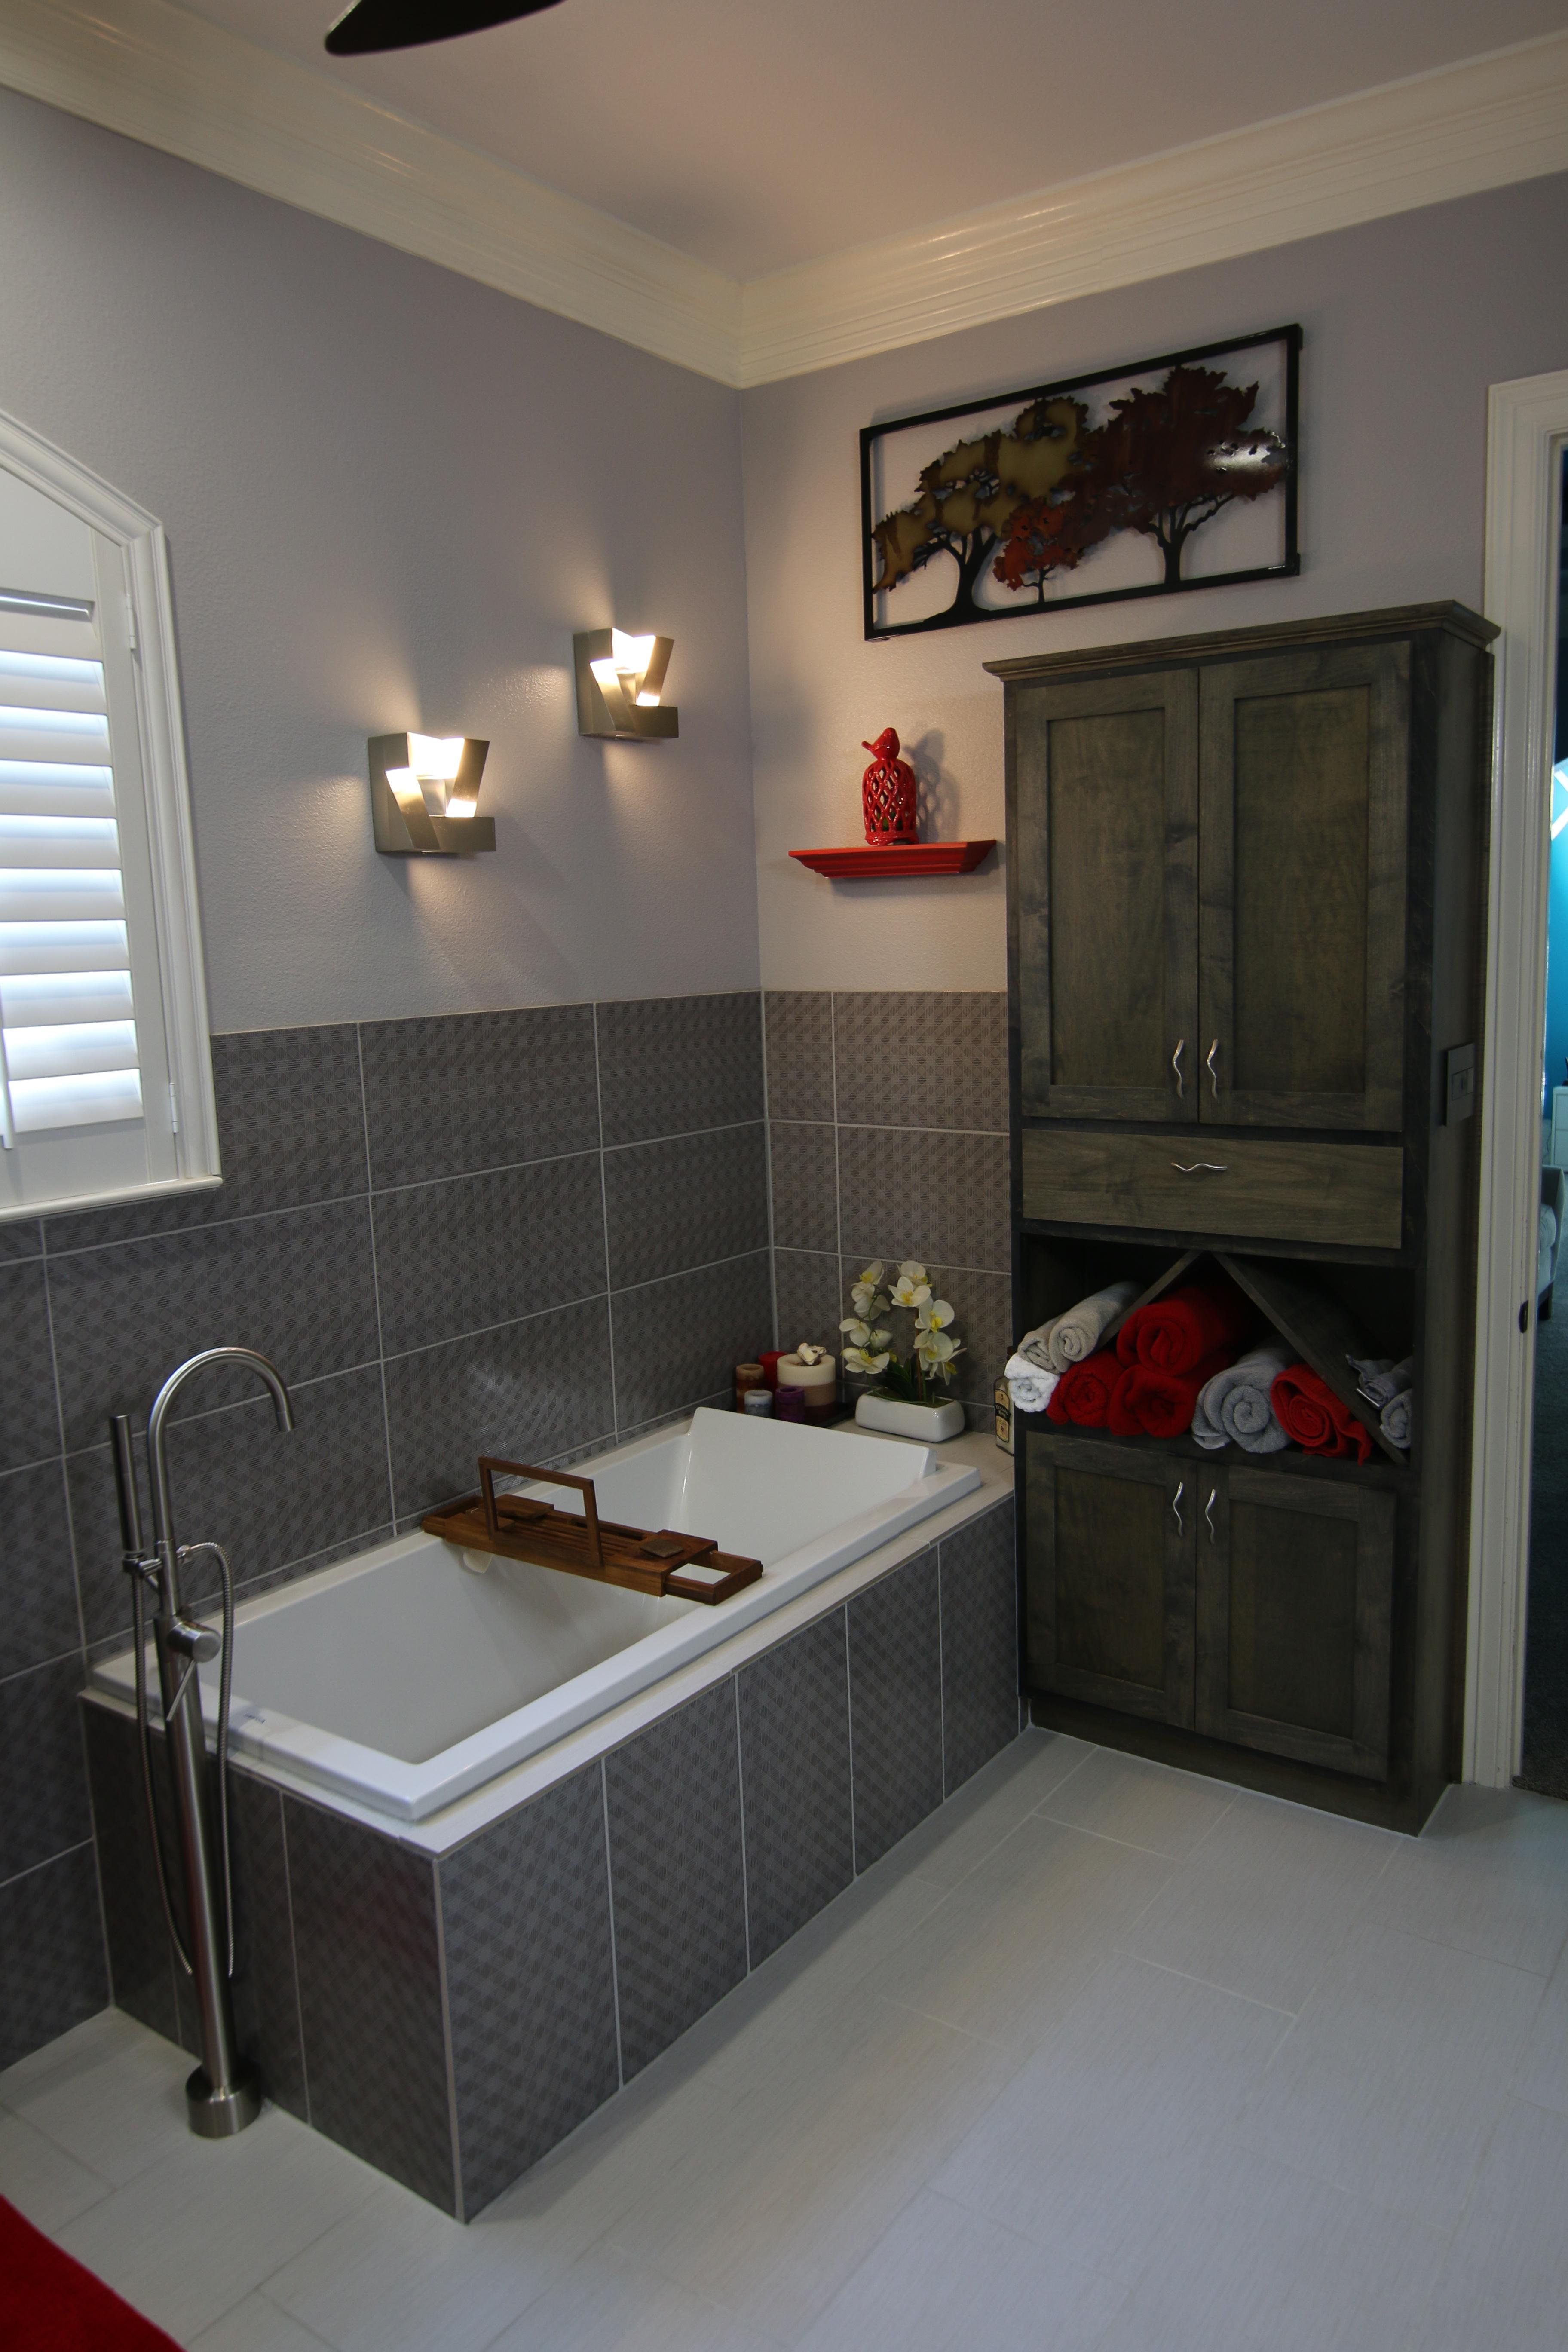 Handicap Home Modifications In Austin - Bathroom remodel austin